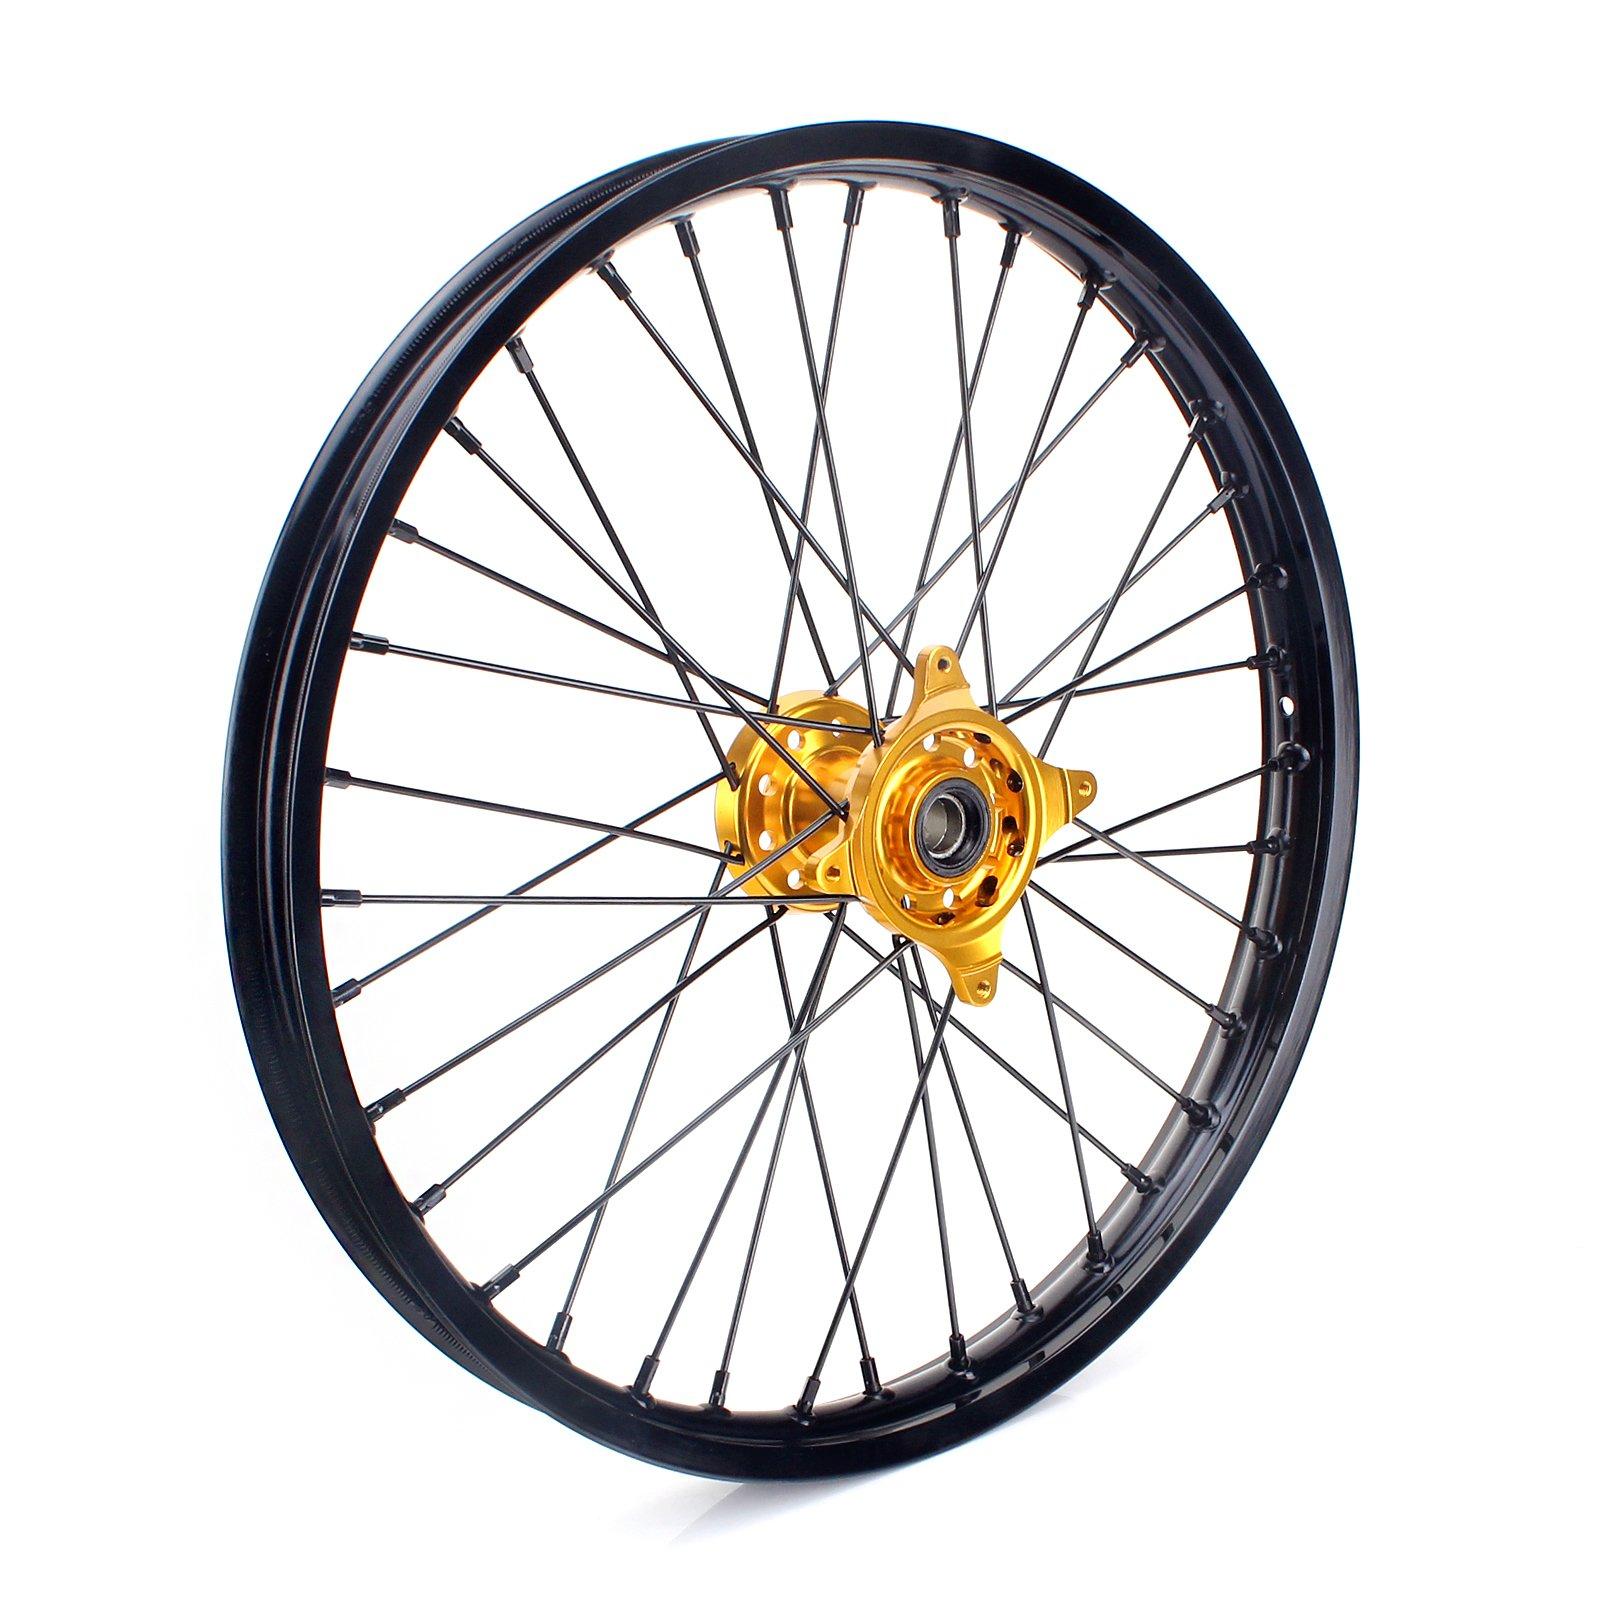 TARAZON 21'' MX Front Complete Wheel Kit Rim Spokes Gold Hub for Suzuki RMZ250 2007-2016 RMZ450 2005-2016